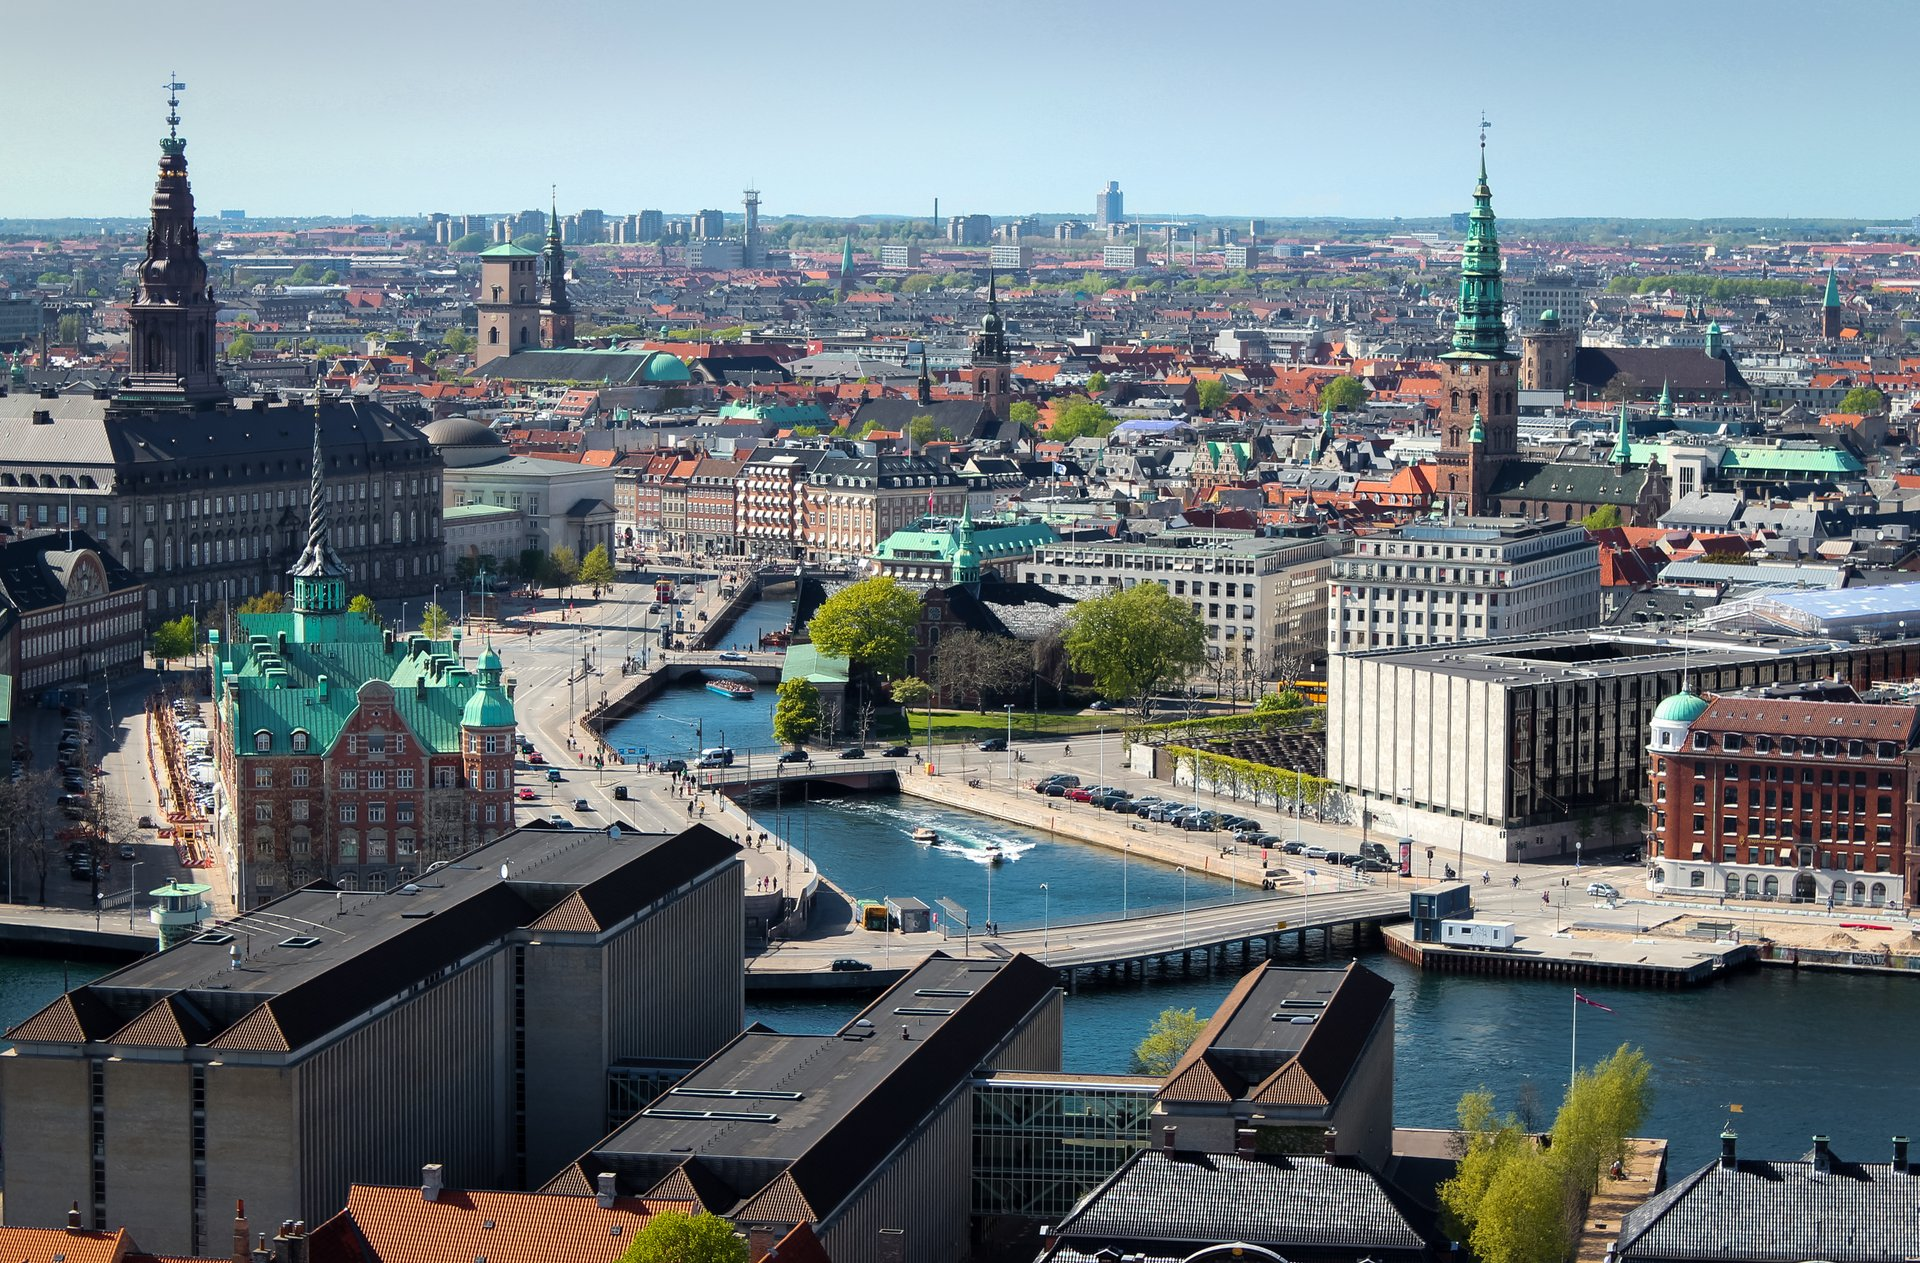 København set lidt fra oven. Hovedstaden bliver til november værtsby for OL-kongressen Smart Cities & Sport Summit. Pressefoto for Wonderful Copenhagen: Thomas Rousing.